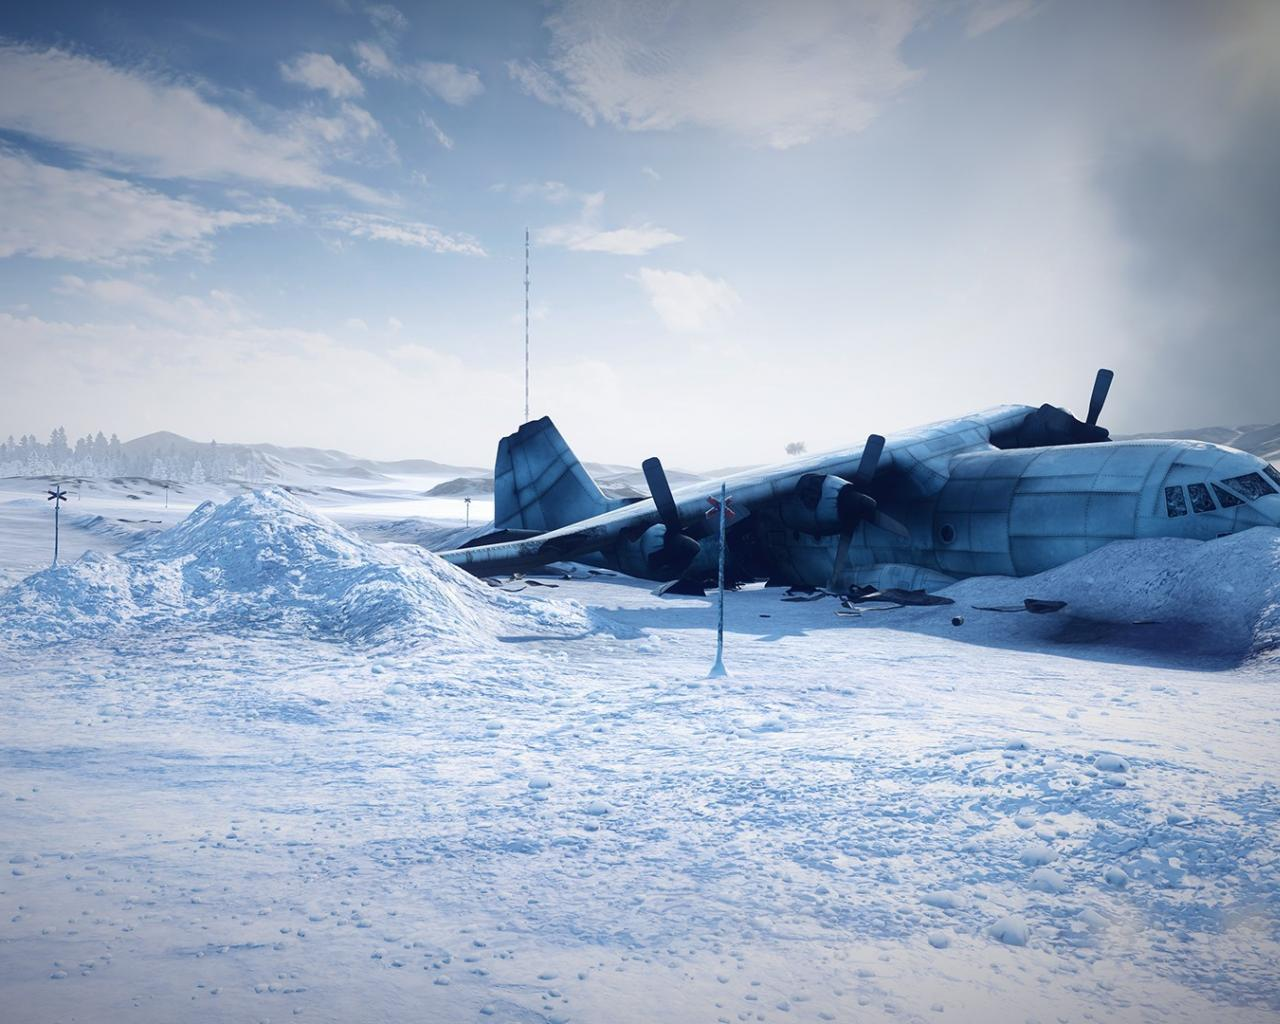 Aircraft aviation plane crash snow wallpaper 60462 1280x1024